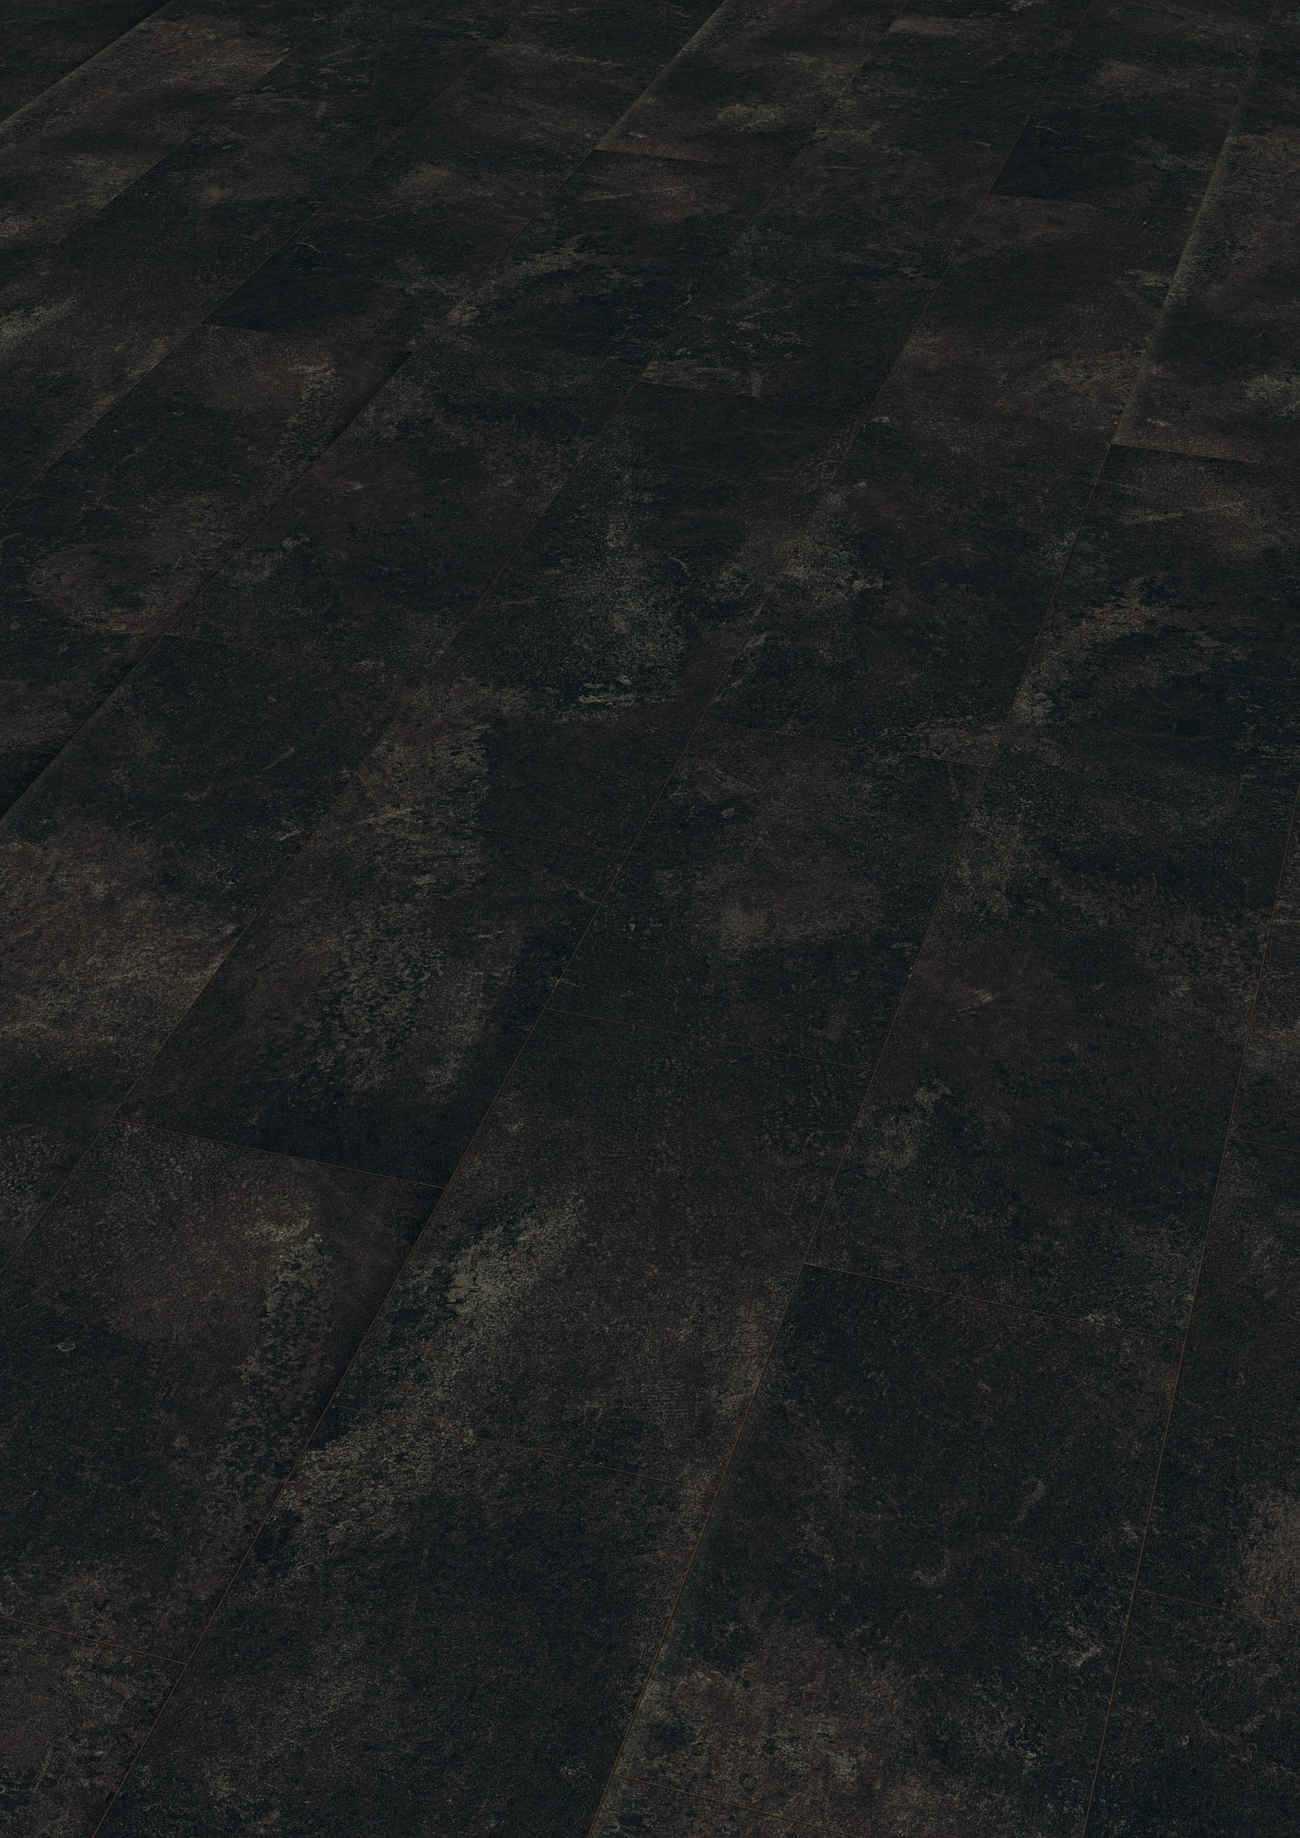 https://www.lgegger.co.il/Uploads/ראשי/ehd011_d3_large_wv6_perspective_10de_flo.jpg